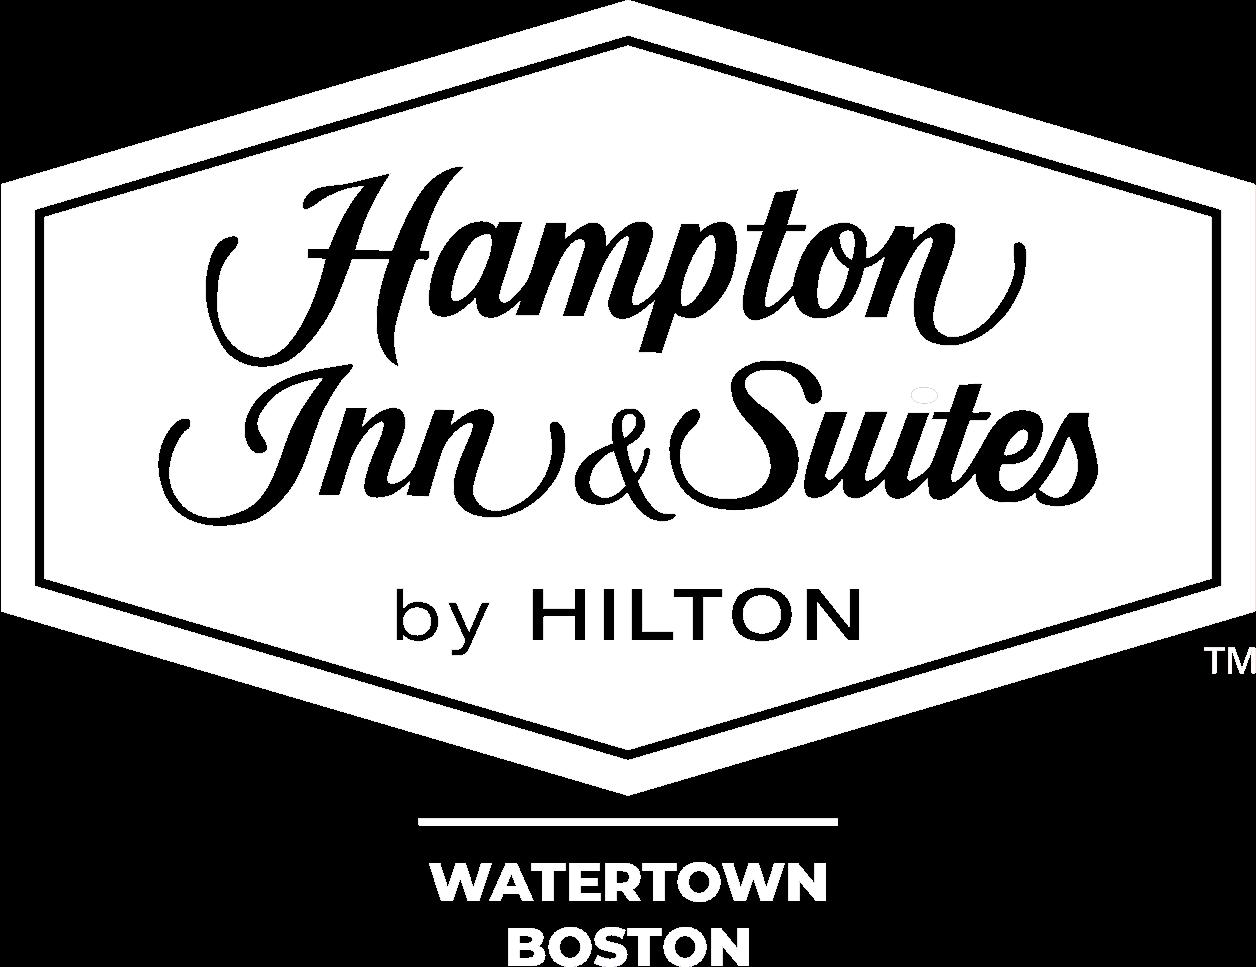 Hampton Inn & Suites by Hilton (Now Open!) Logo